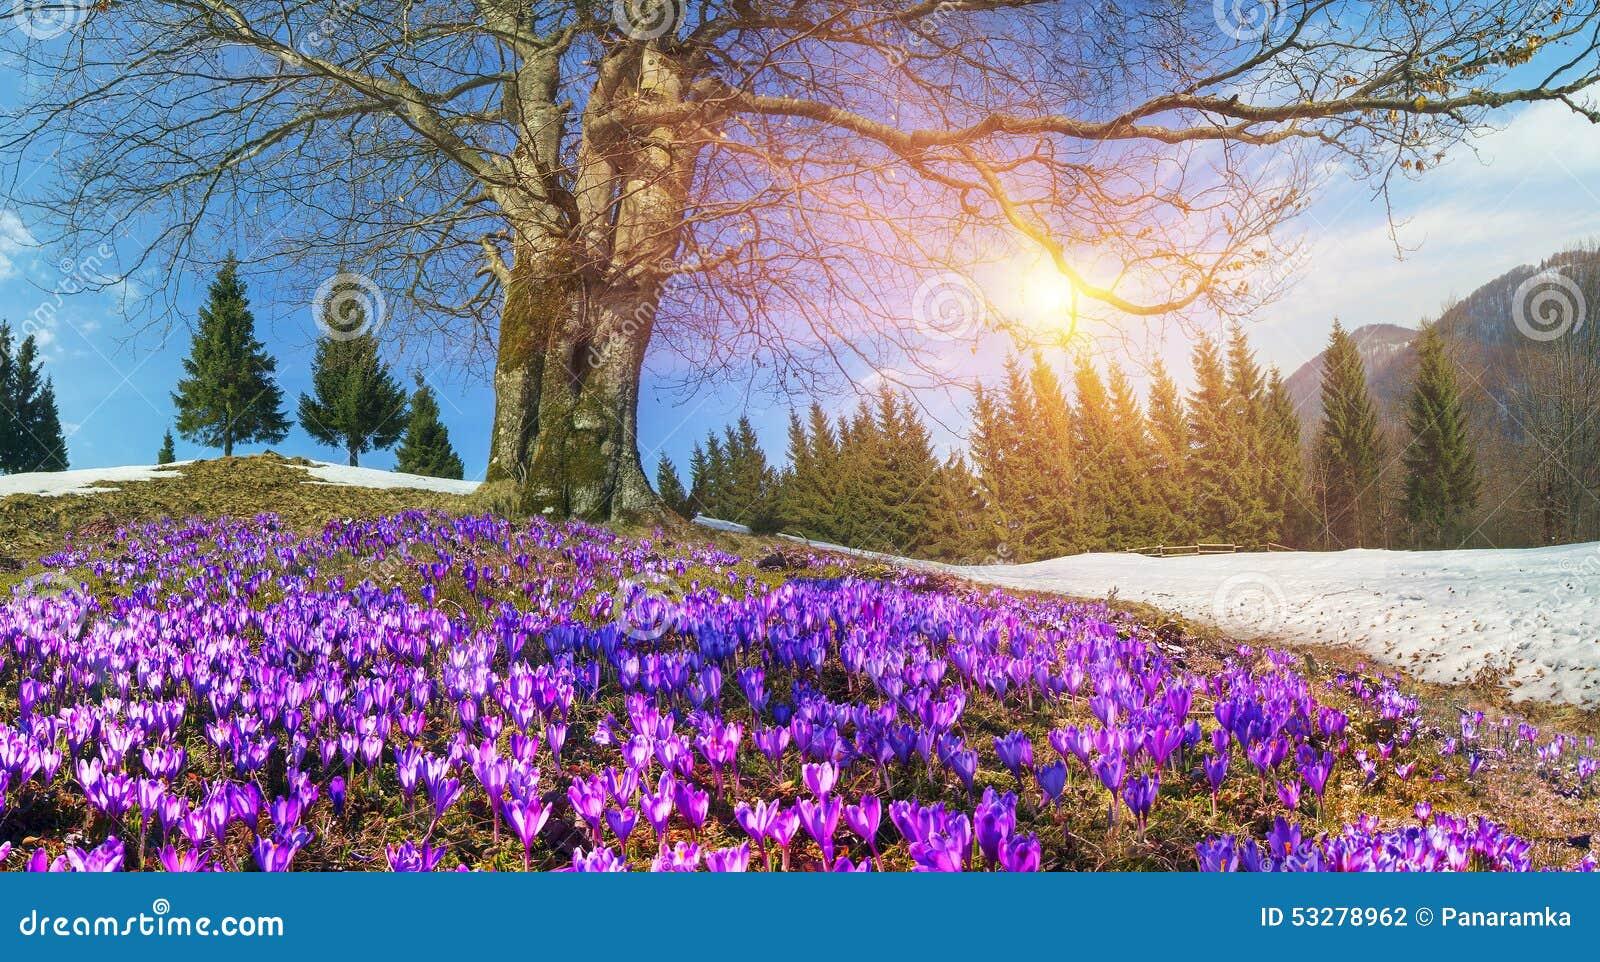 Snow flowers crocuses stock photo image of lovely 53278962 download snow flowers crocuses stock photo image of lovely 53278962 mightylinksfo